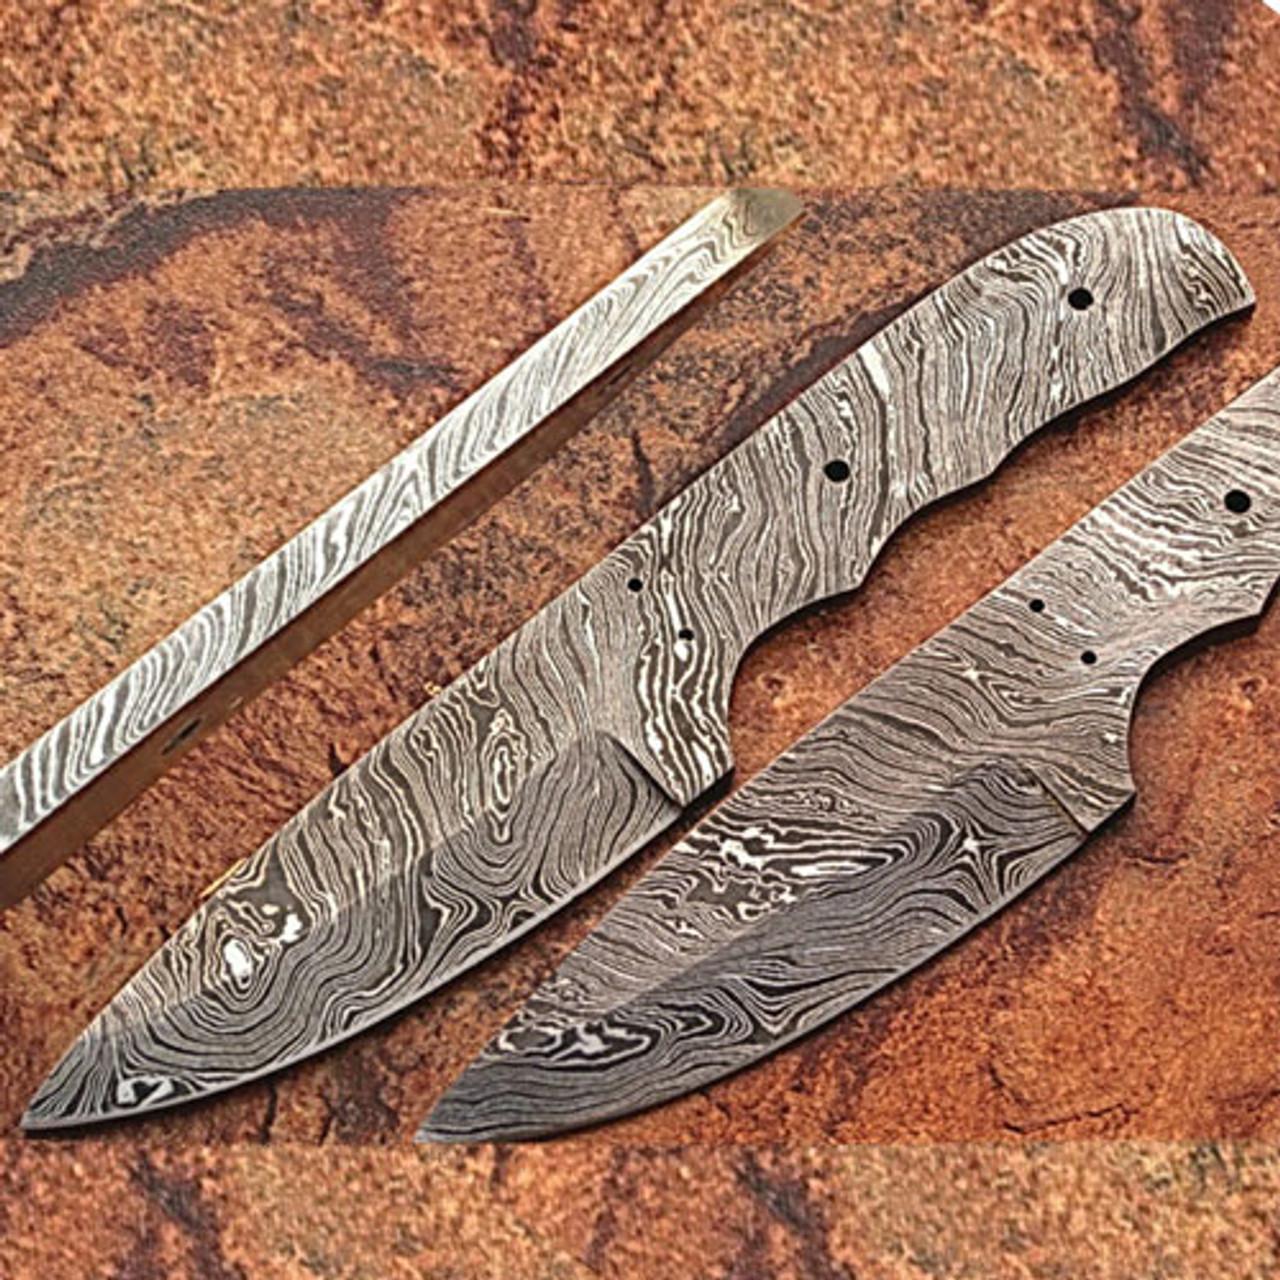 Custom FULL DAMASCUS Steel Militia-cut Knife (Blank Blade) 9 25in 1095 Steel